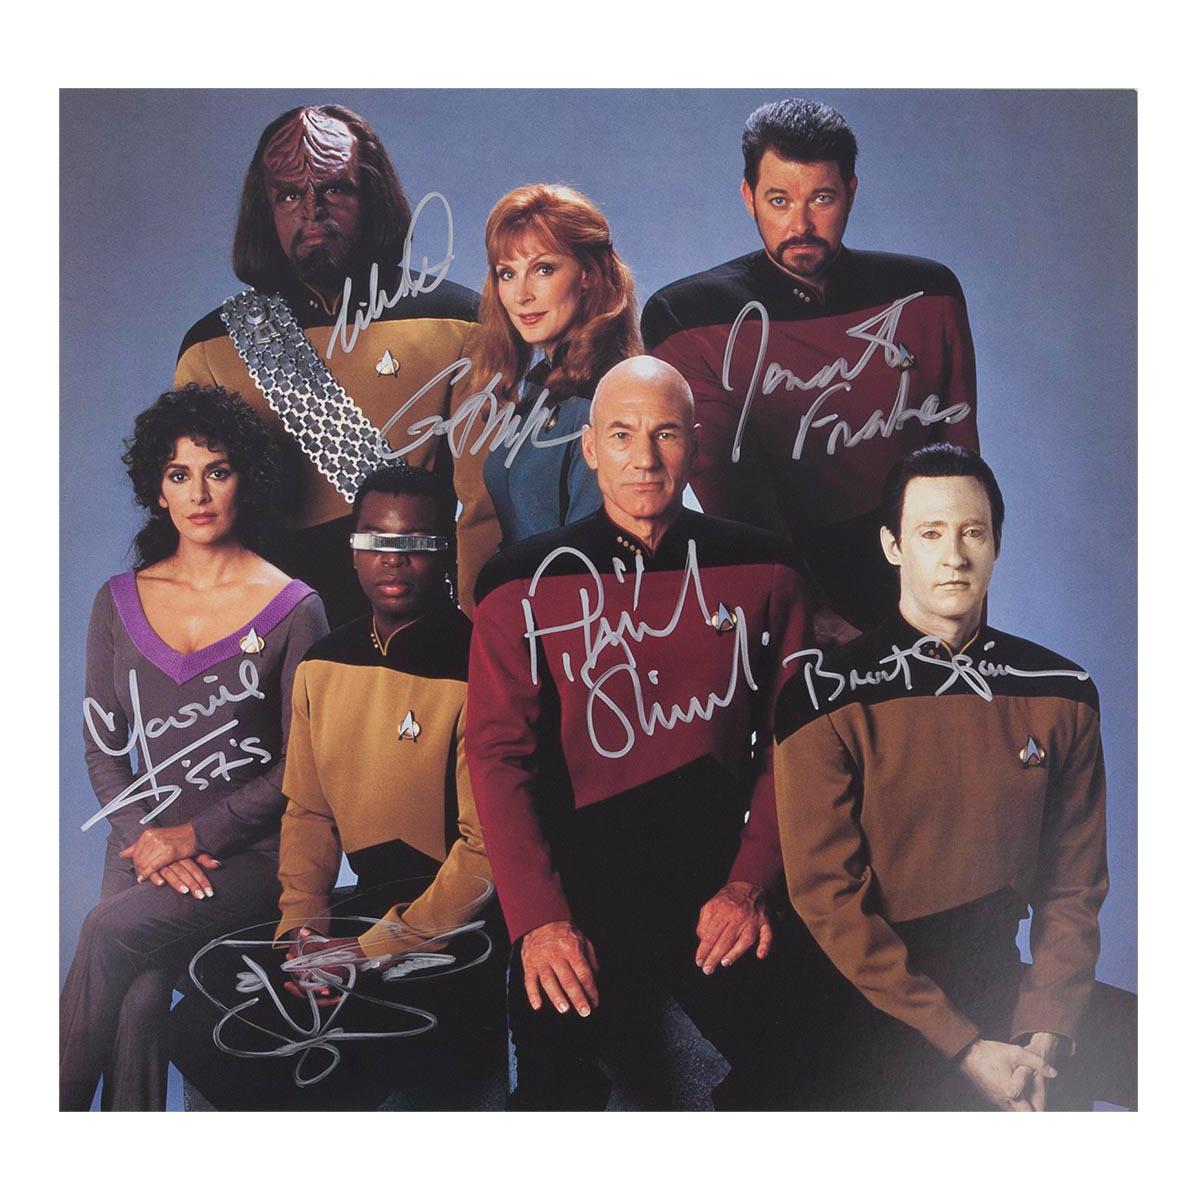 Star Trek The Next Generation Autographed Crew Photo [12x12]